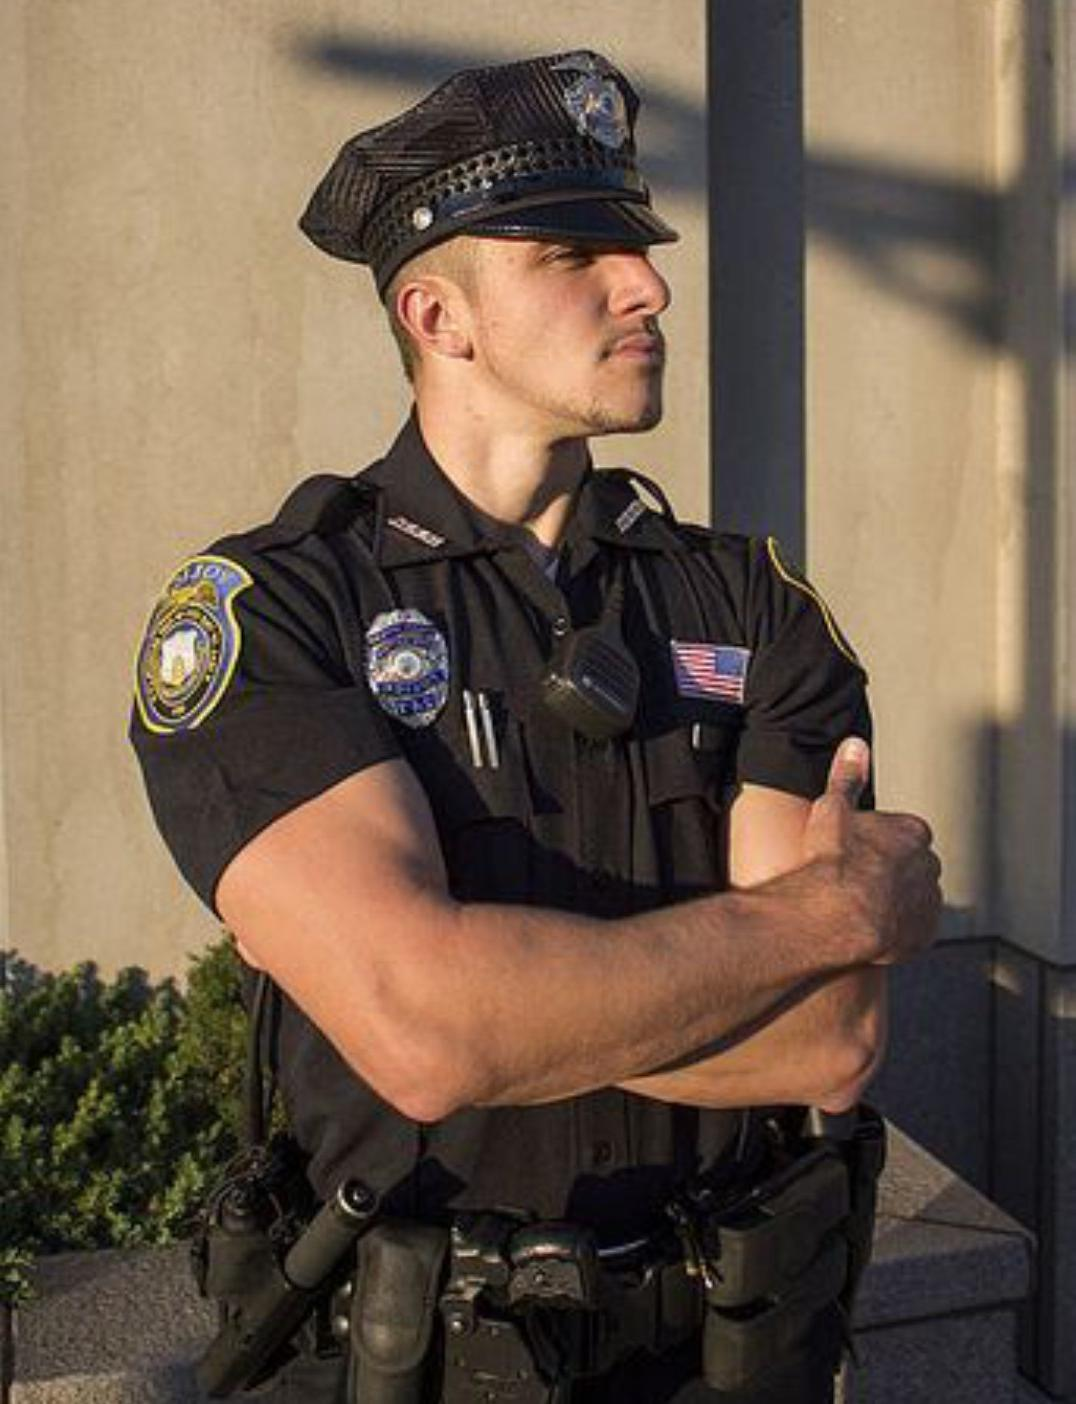 masculine-alpha-male-american-police-officer-uniform-stud